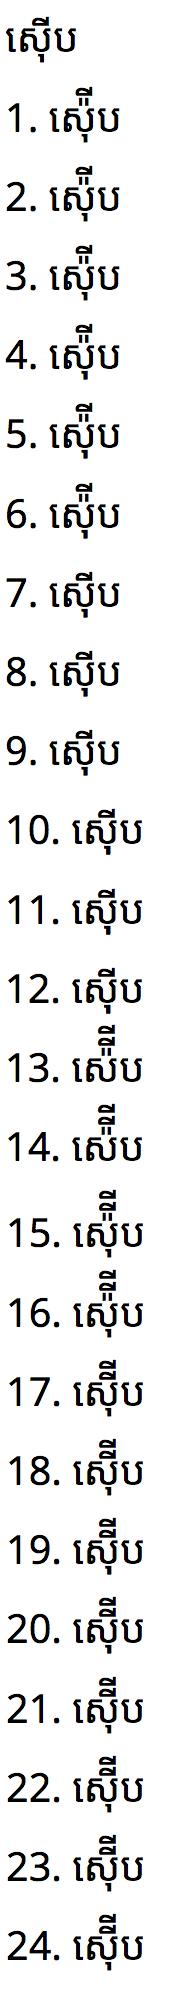 khmer_seep_firefox